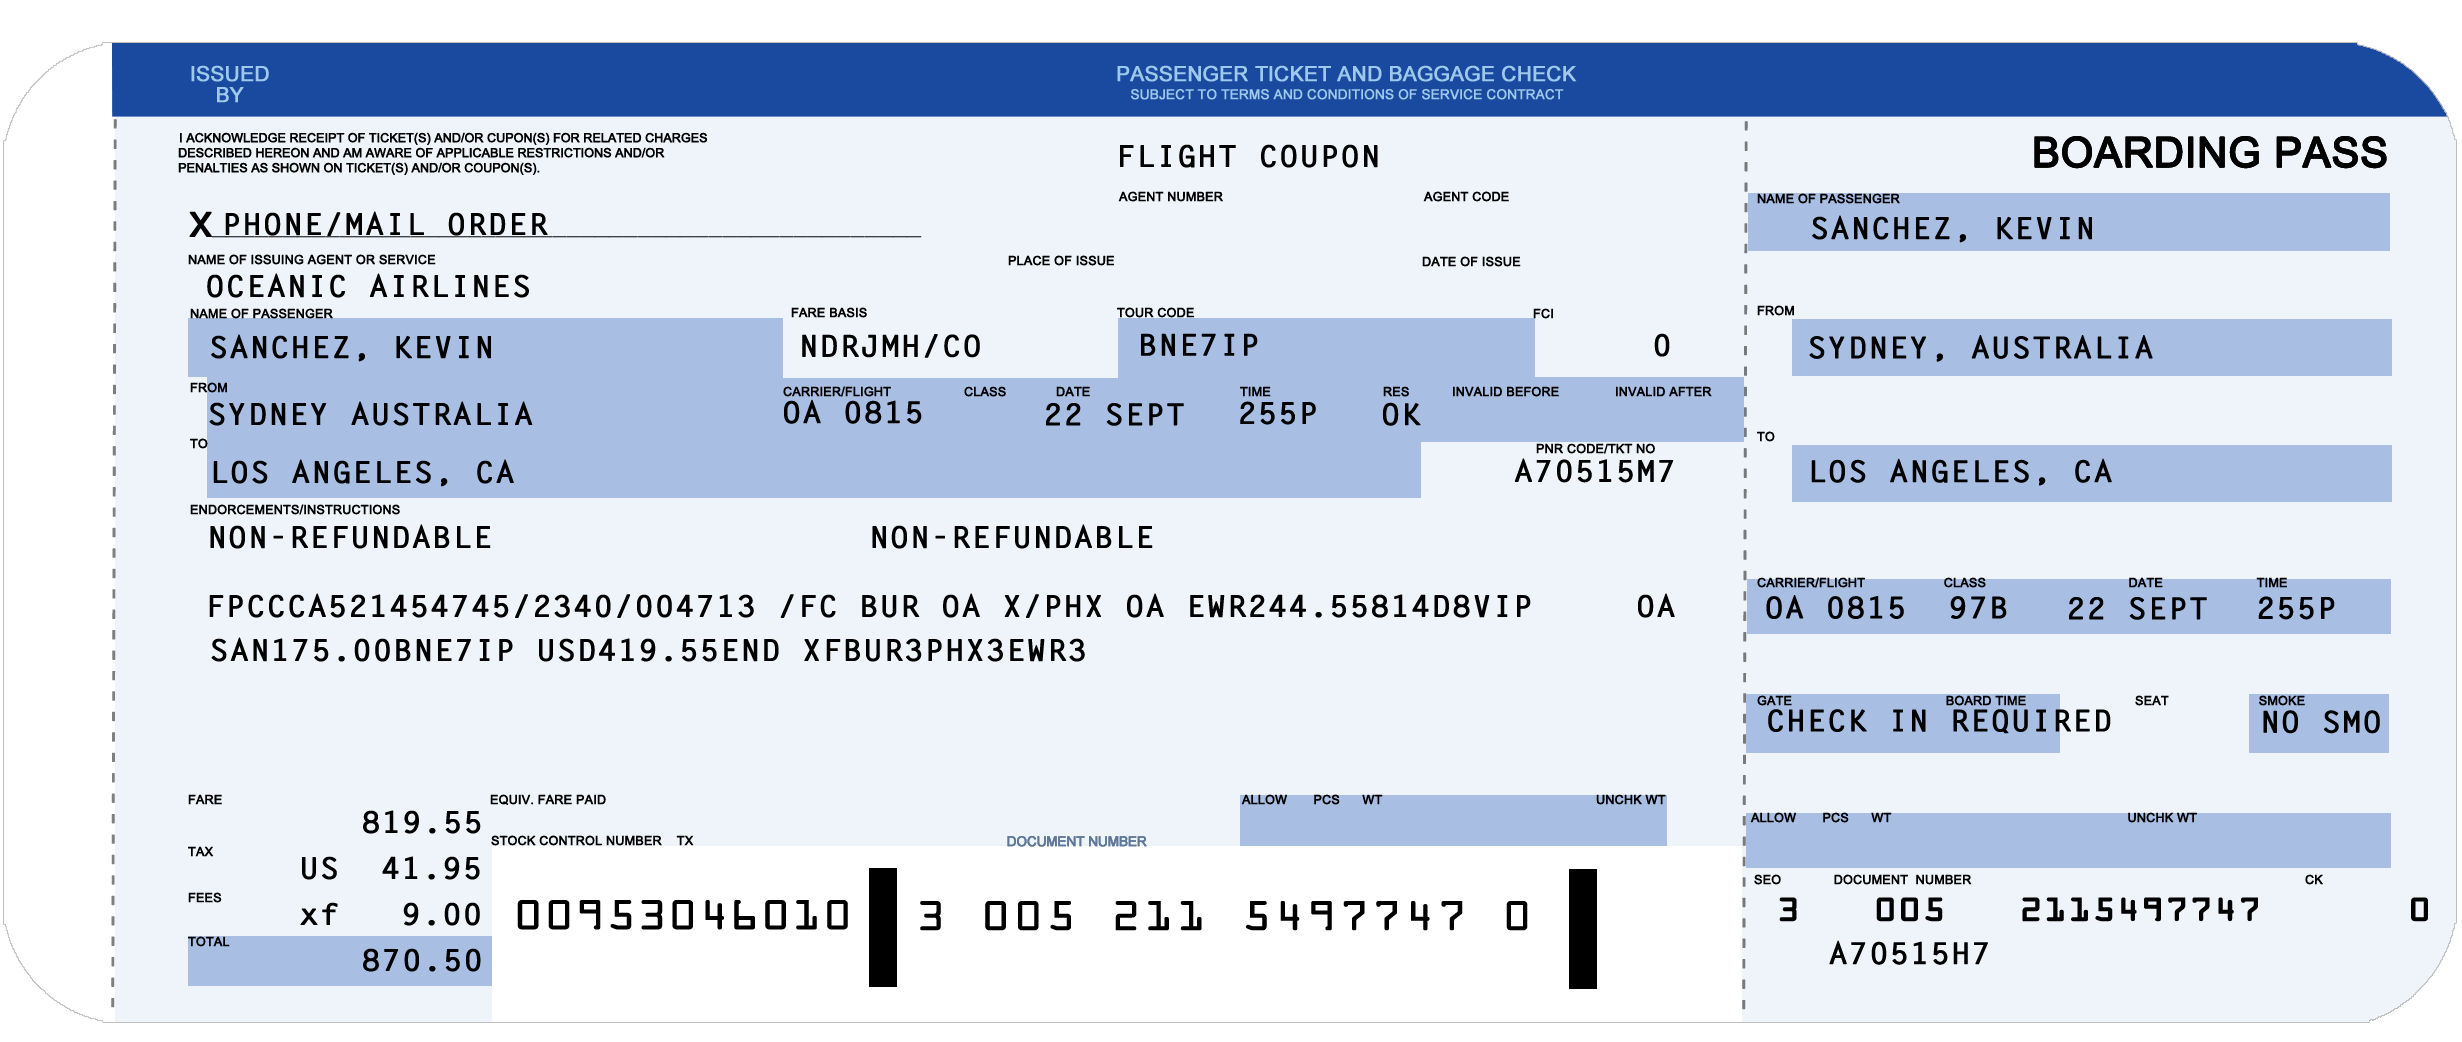 Boarding Pass Template